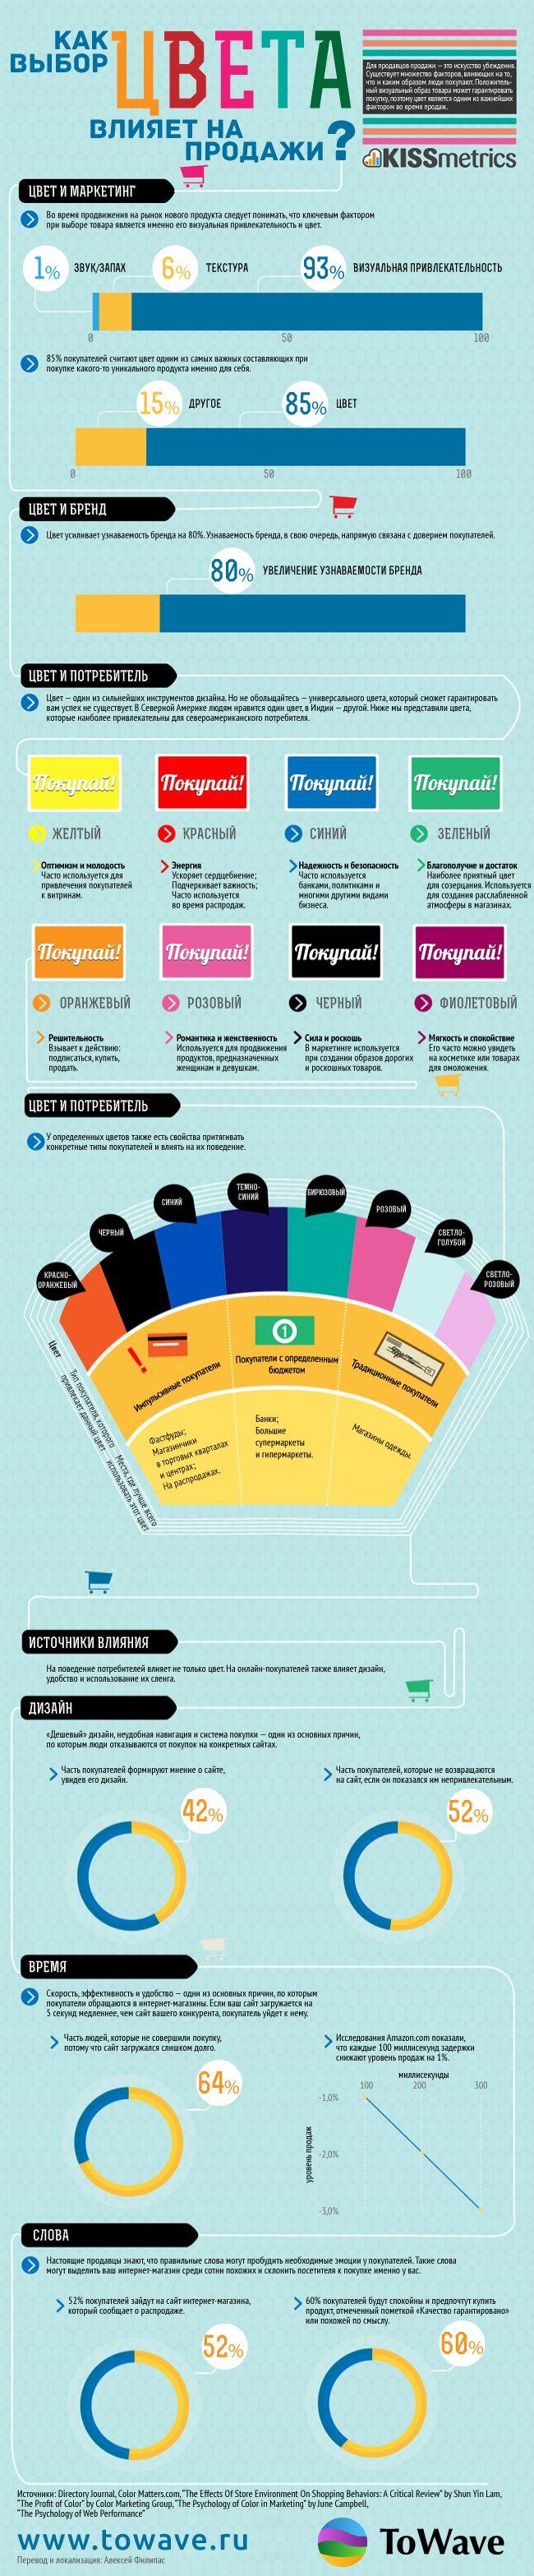 Инфографика: как выбор цвета влияет на продажи | Get reliable SEO services at http://www.techhelp.ca/seo now